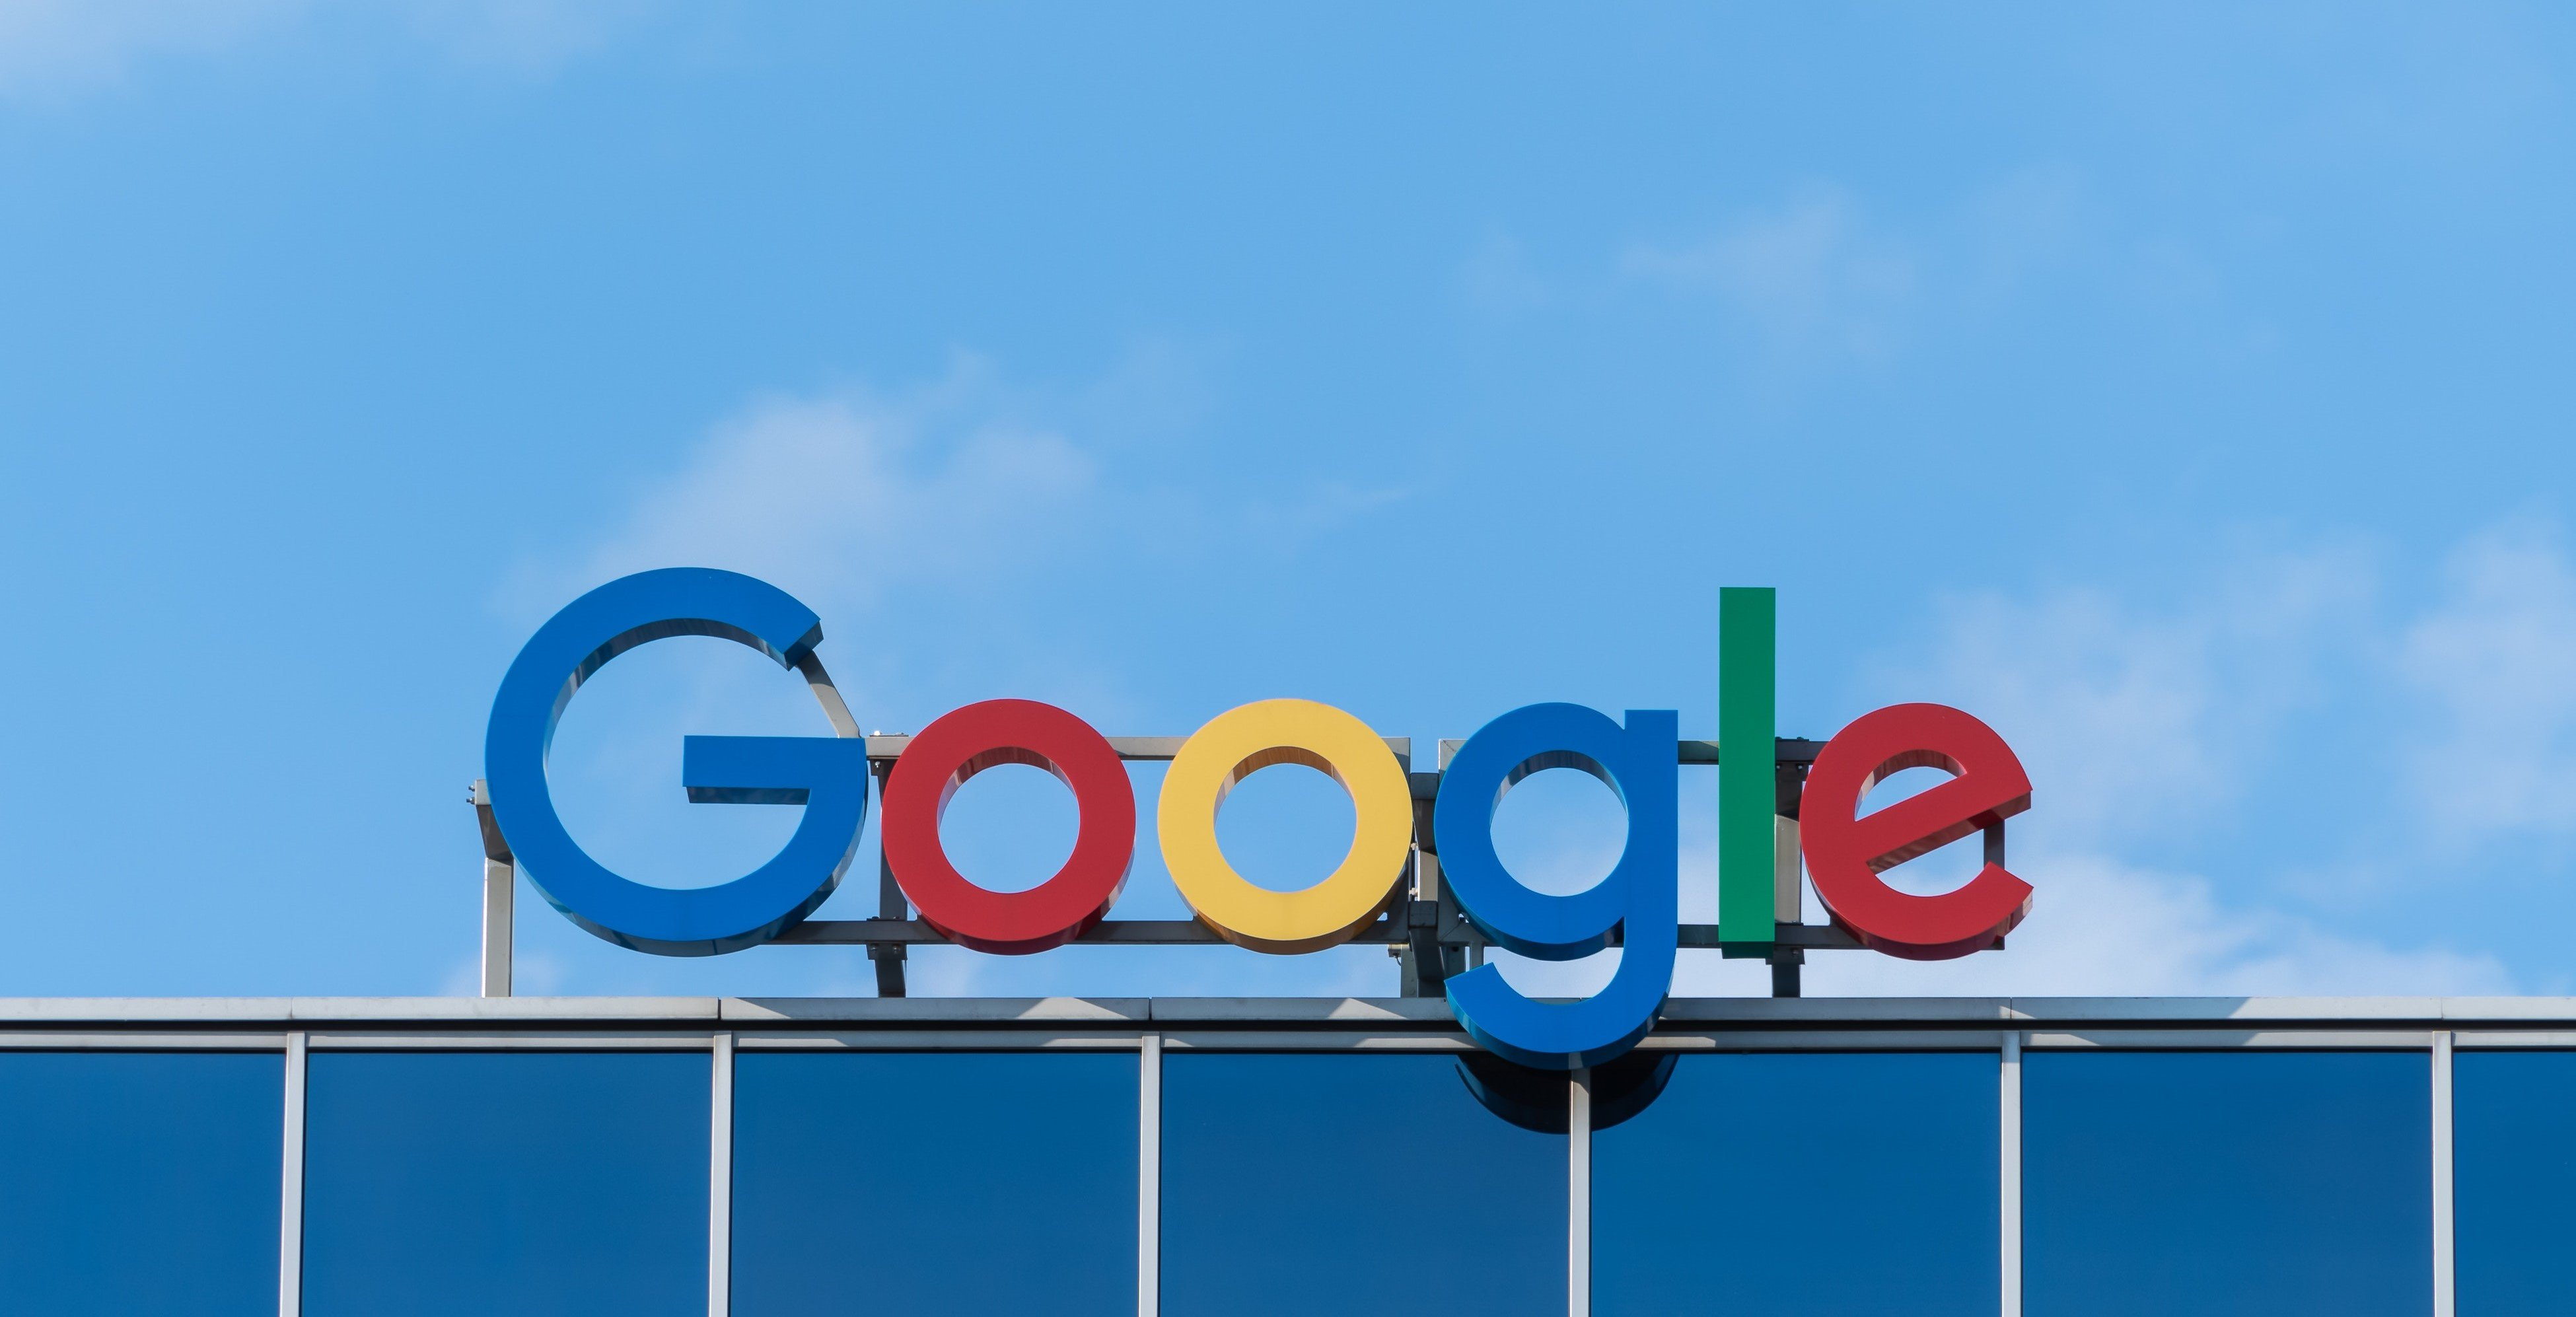 Google image - Copy